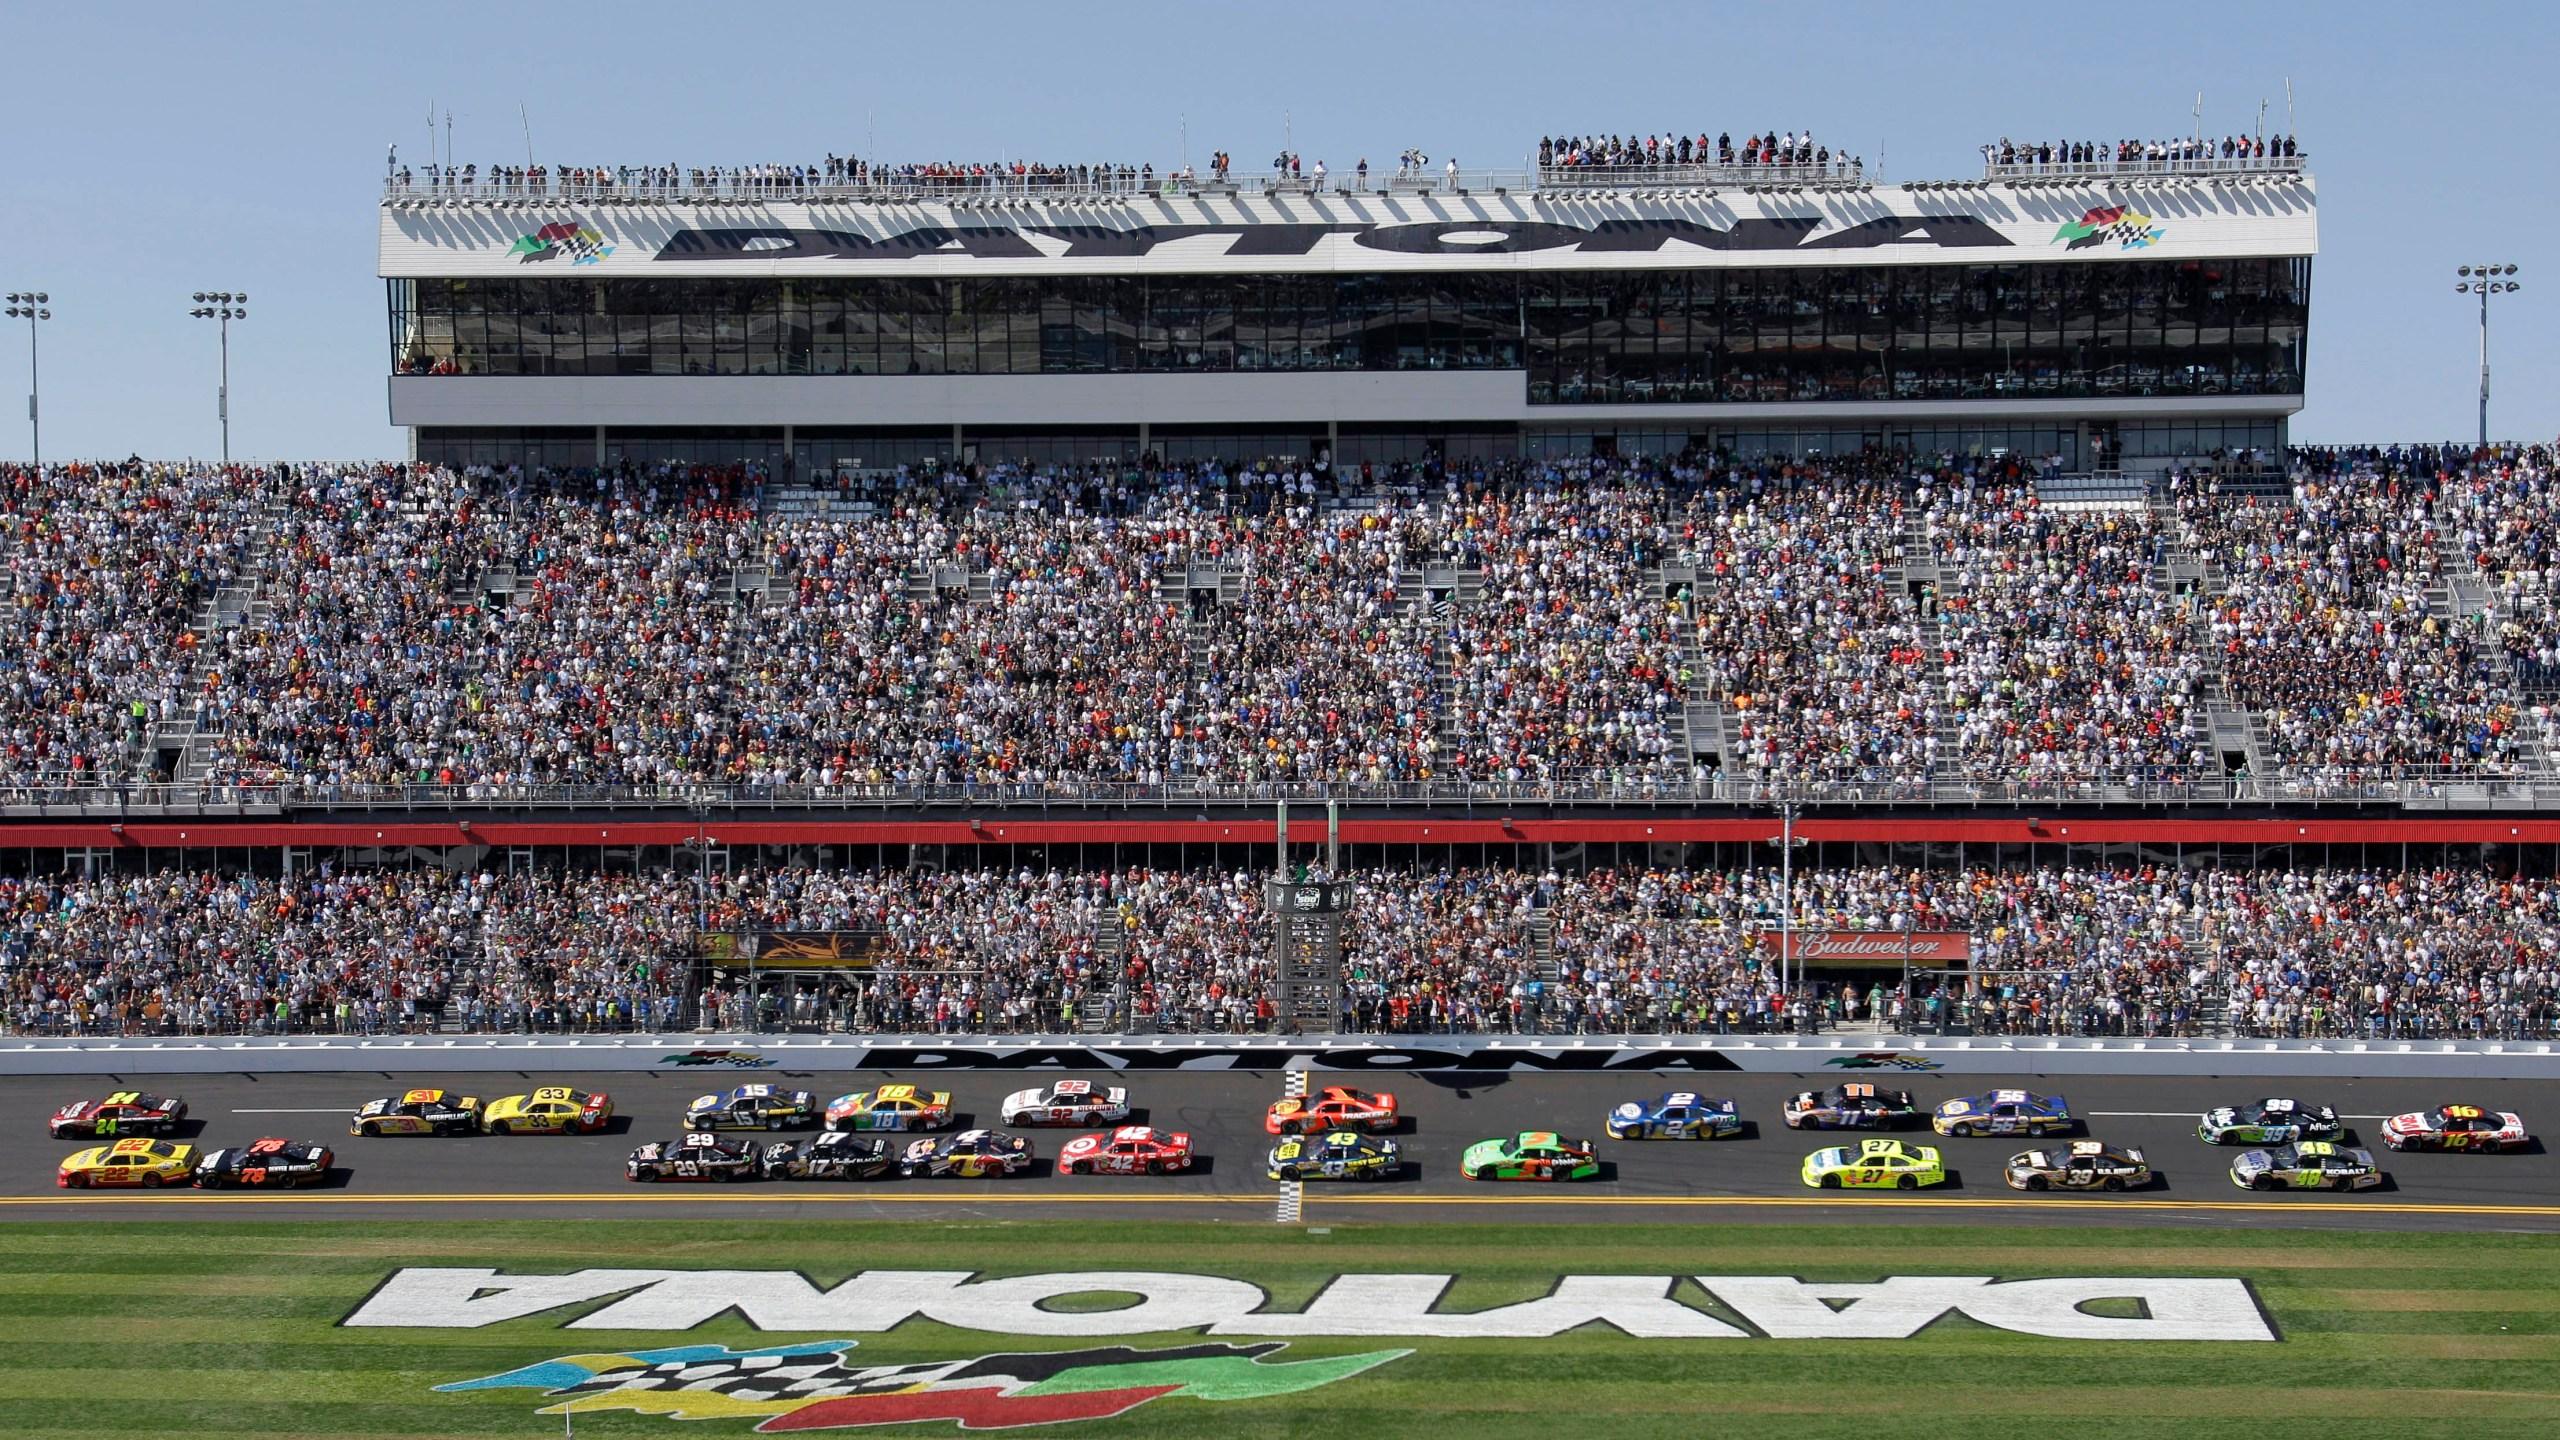 NASCAR Daytona Toyota Auto Racing_1526073175658